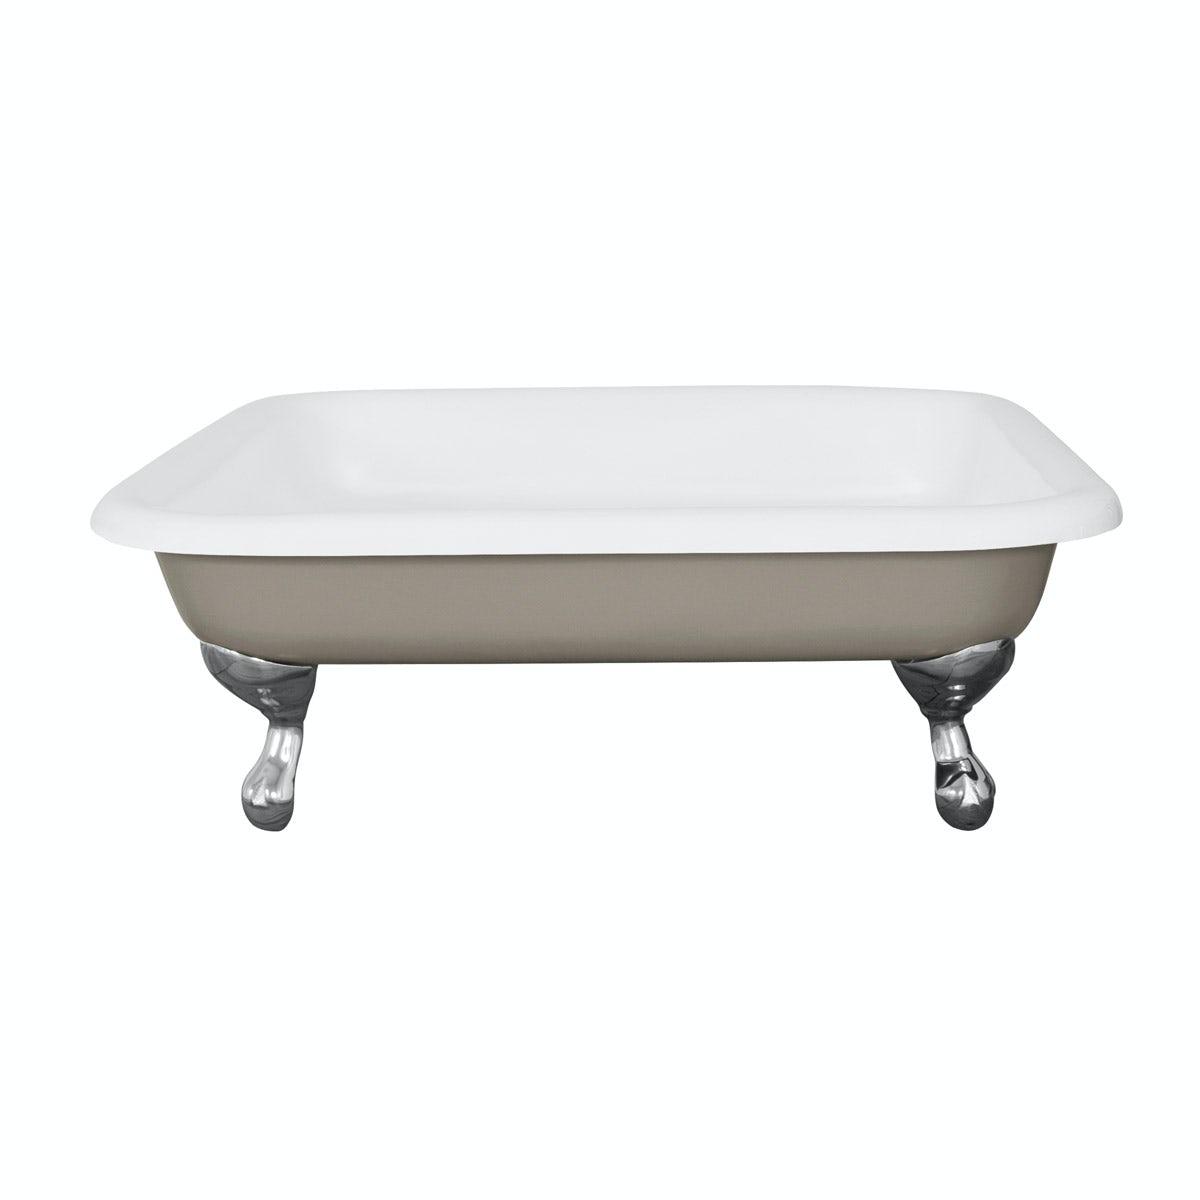 The Bath Co. Lewes pavilion grey cast iron shower tray